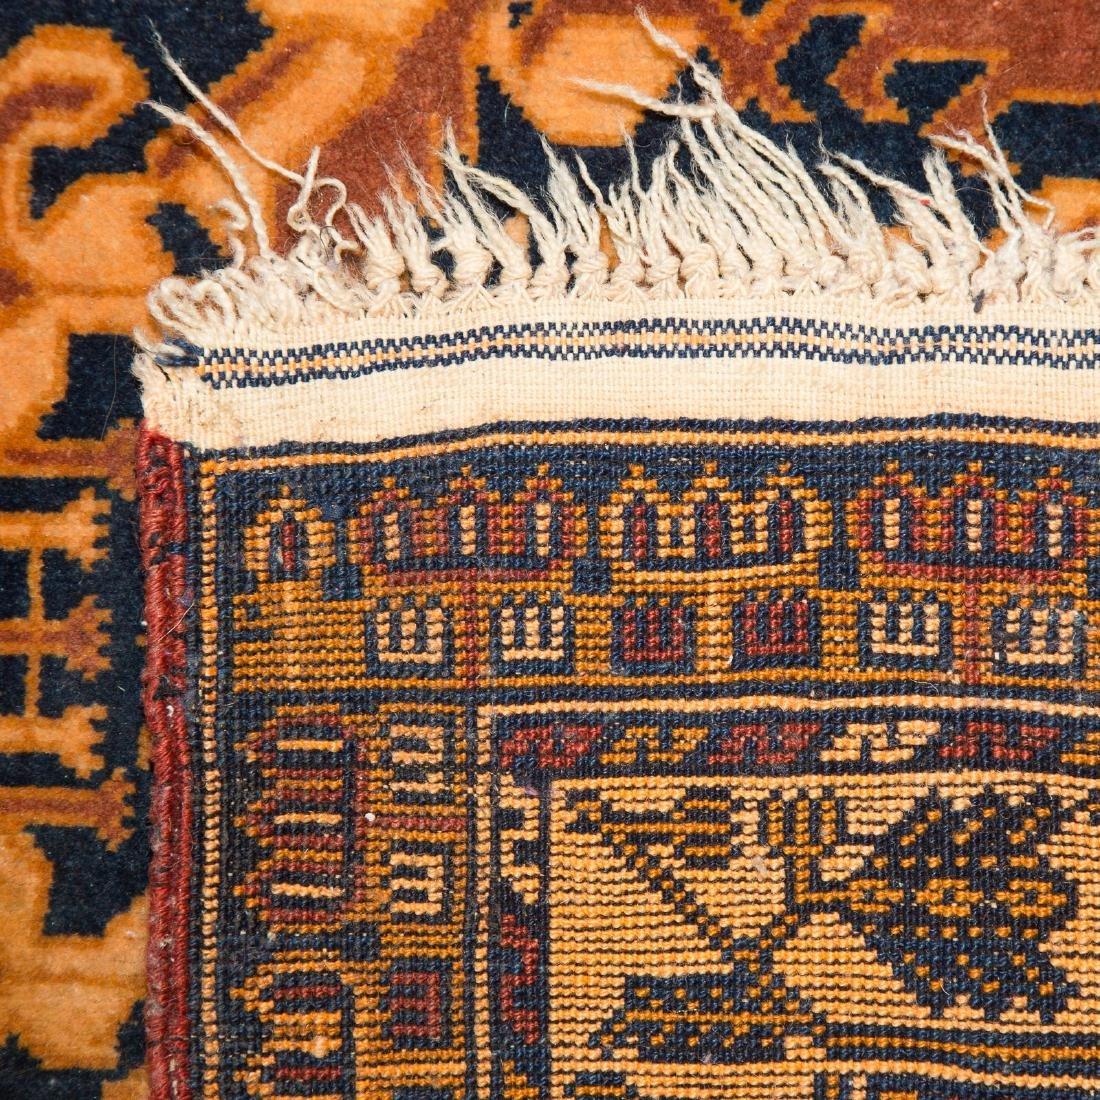 Persian Tribal rug, approx. 3 x 4.7 - 3